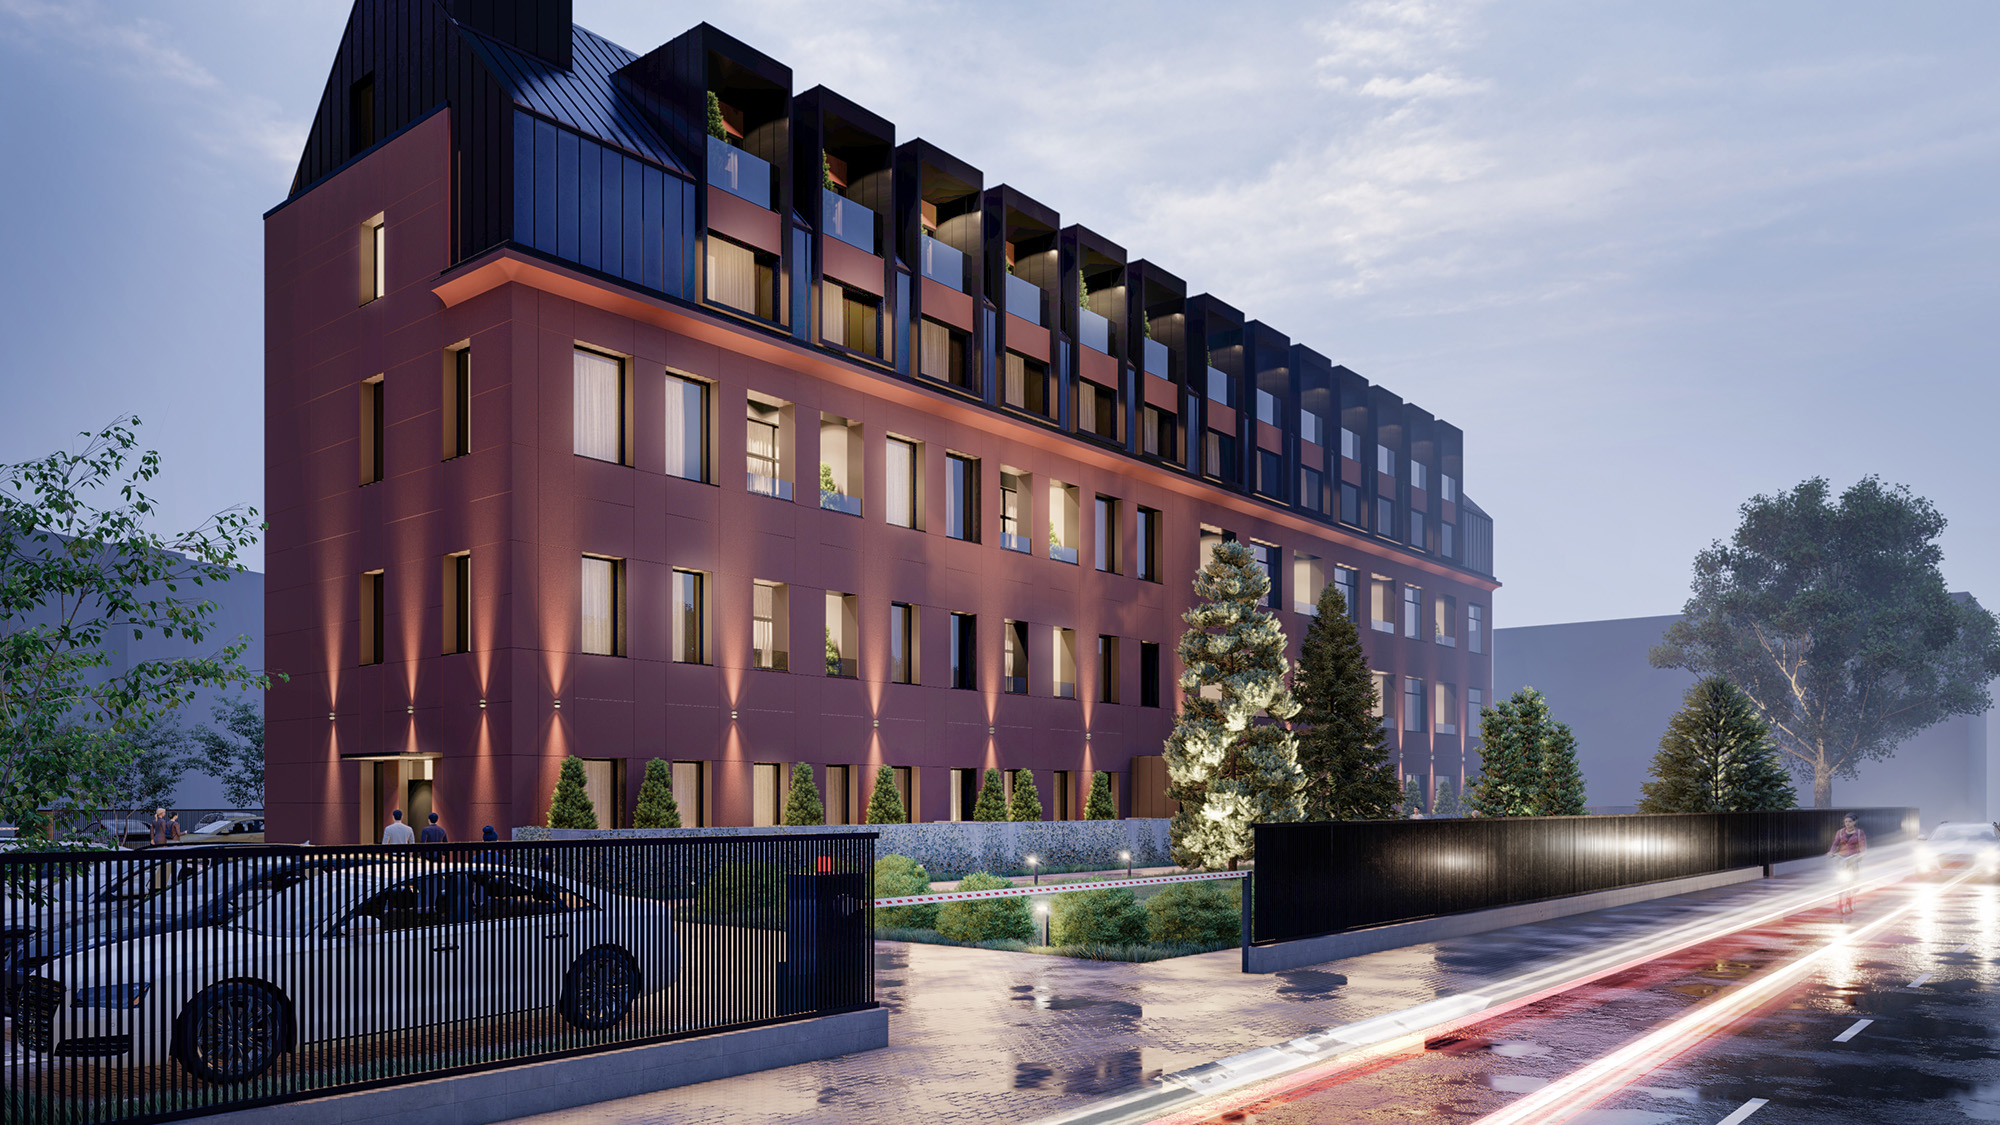 Proiect arhitectural de bloc rezidențial modern